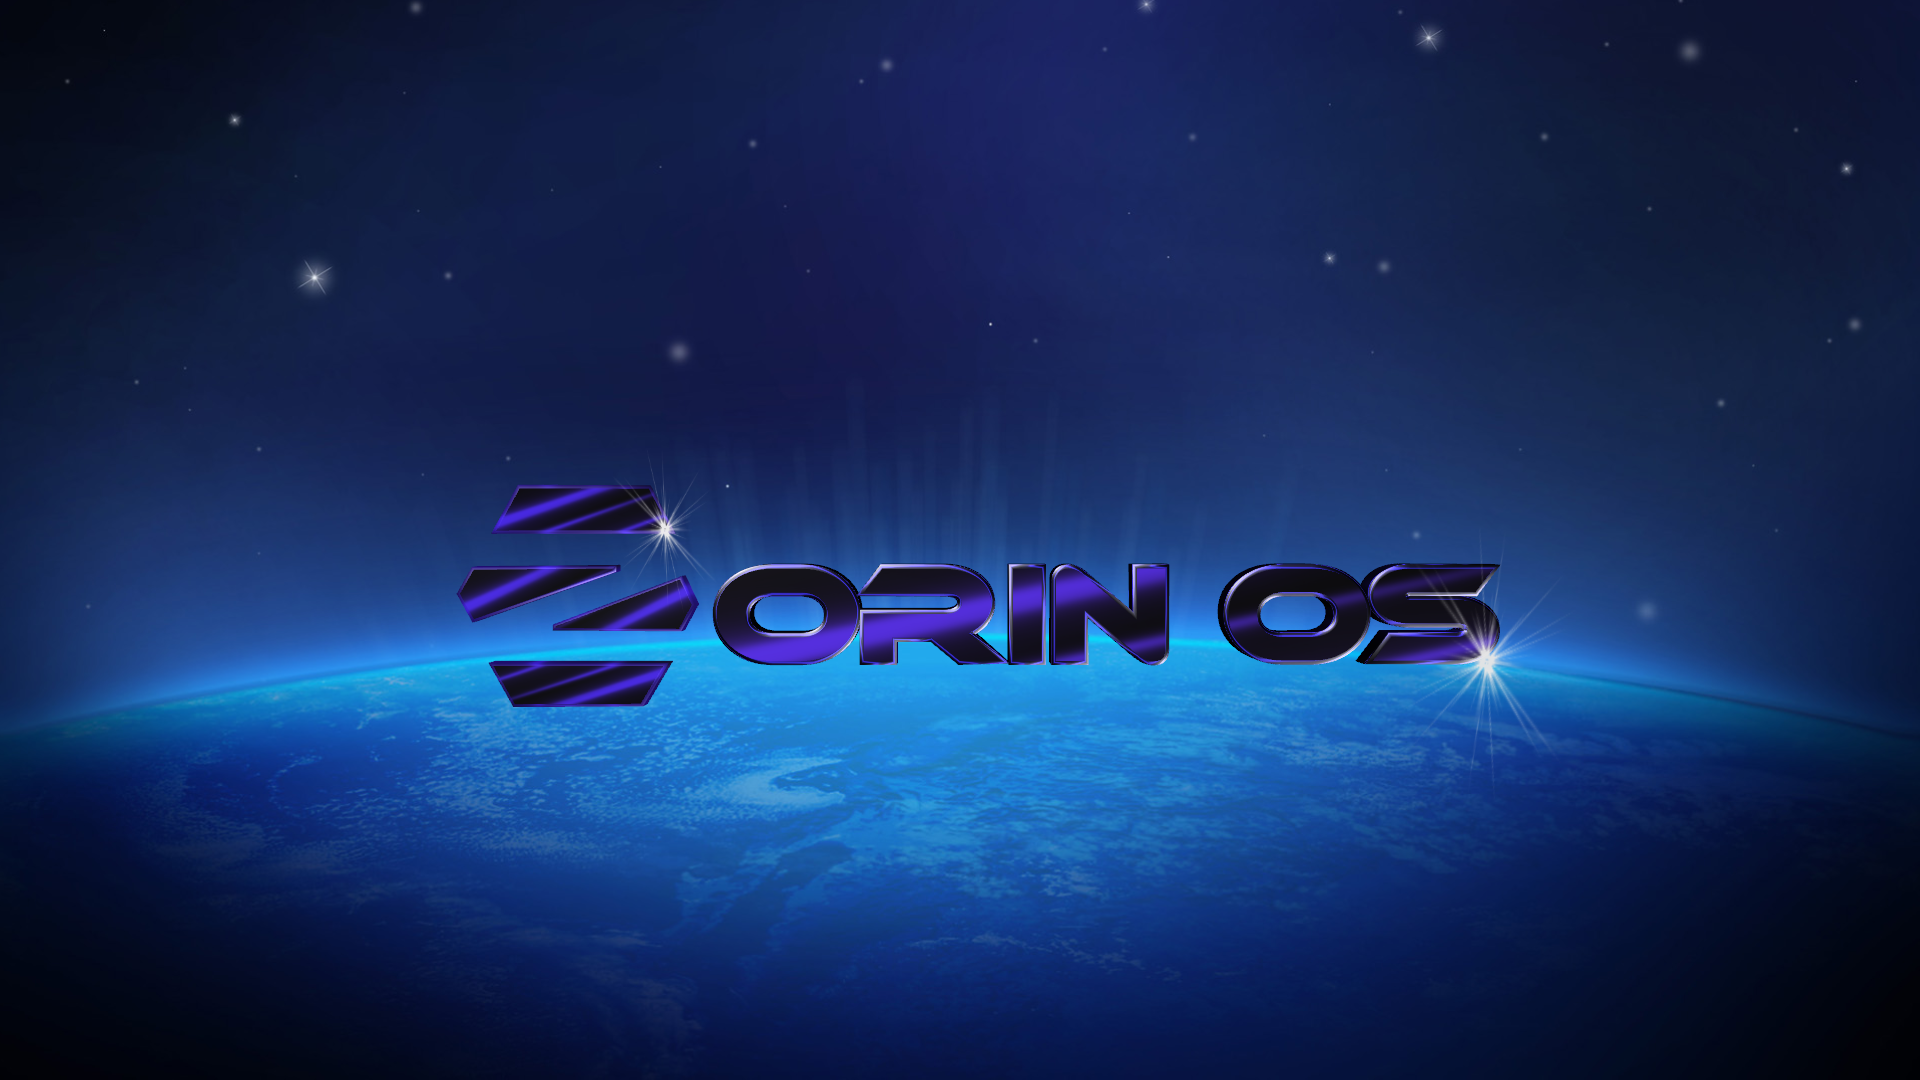 Zorin OS Default Desktop Wallpapers OS Wallpapers